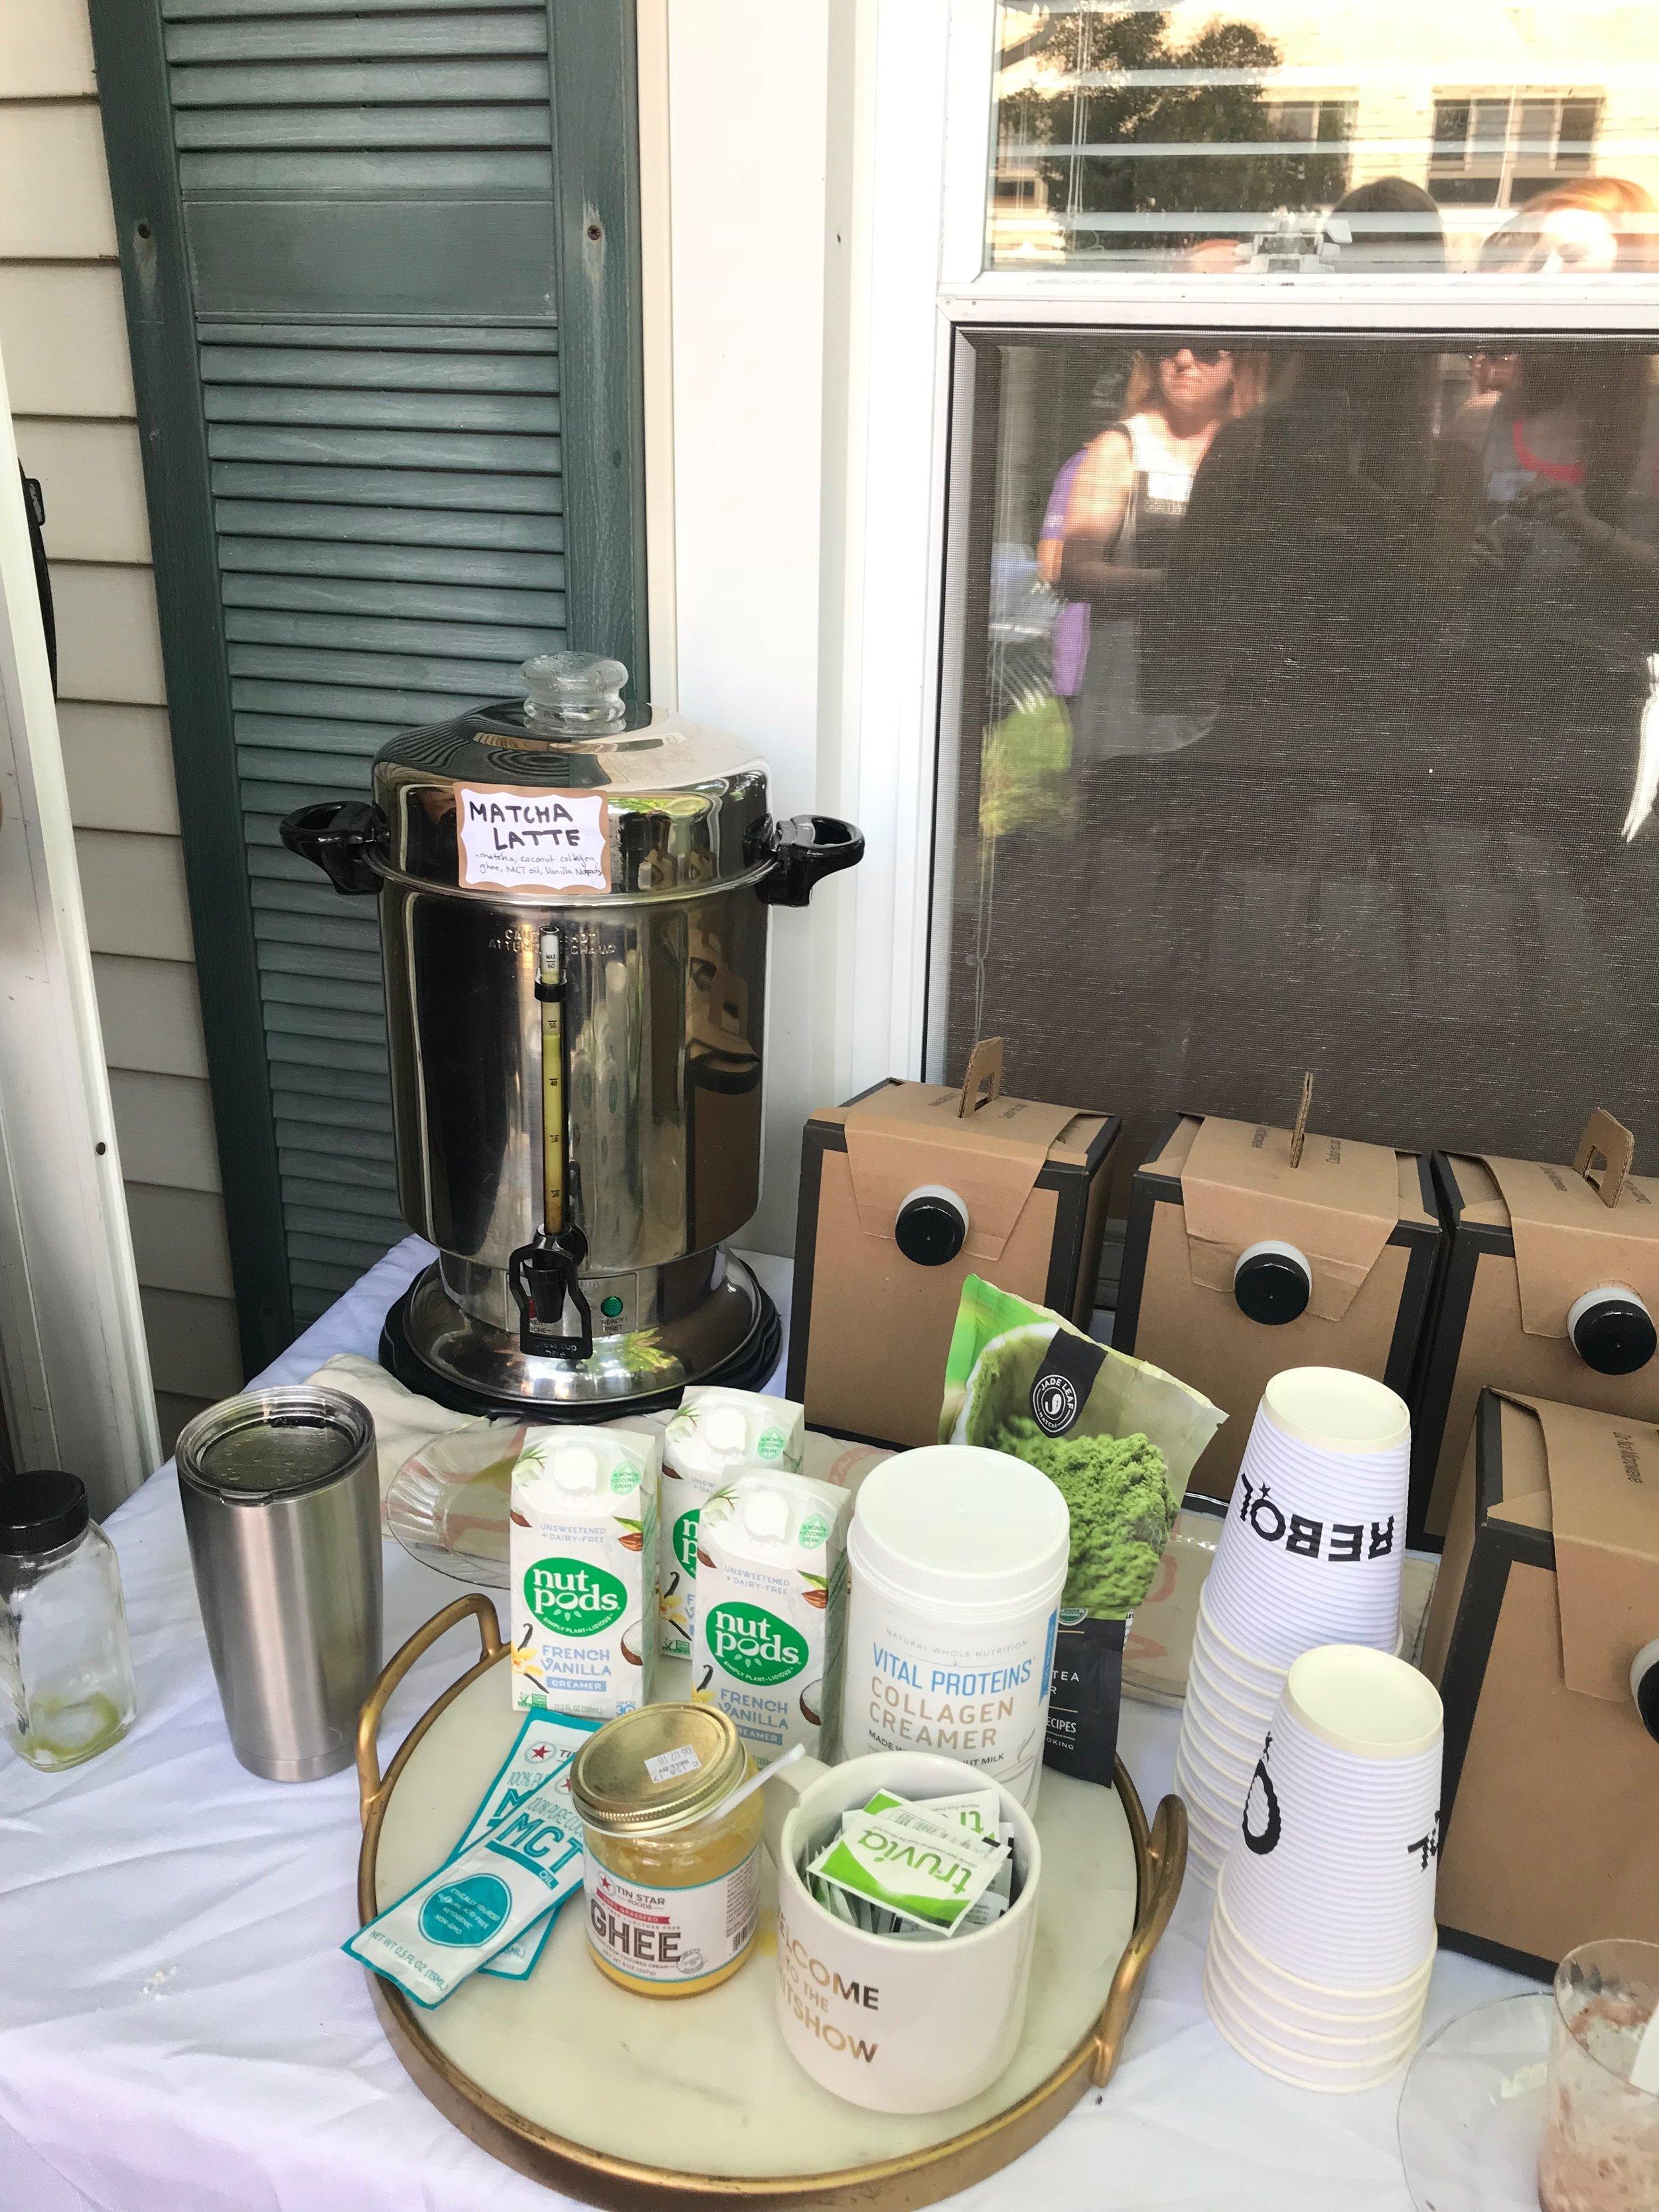 Matcha bar set up at Danika Brysha's Summer 2018 Brunch Series in CLE